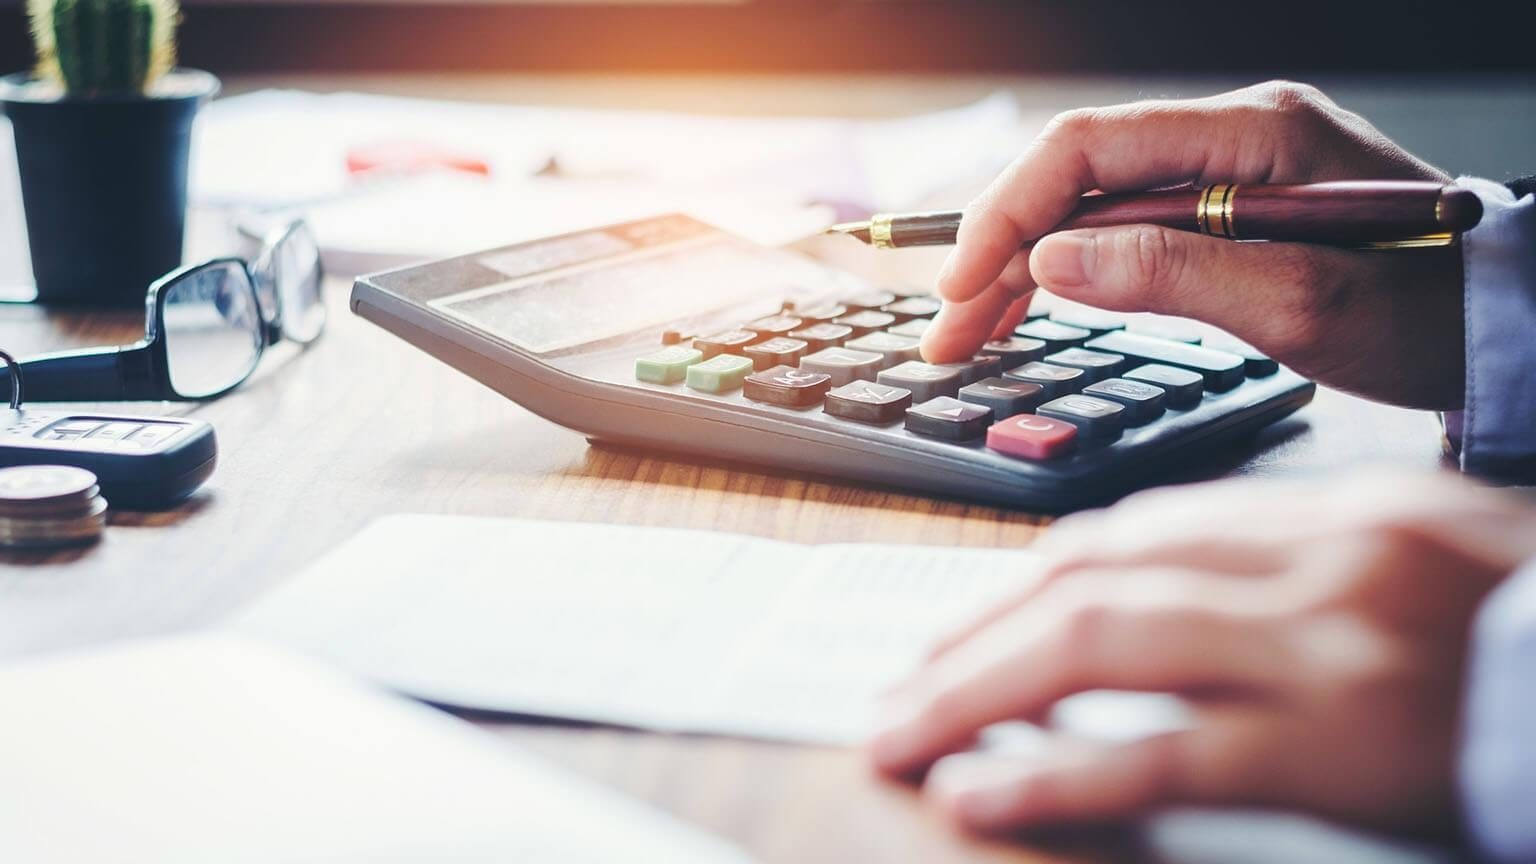 Closeup of a man using a calculator